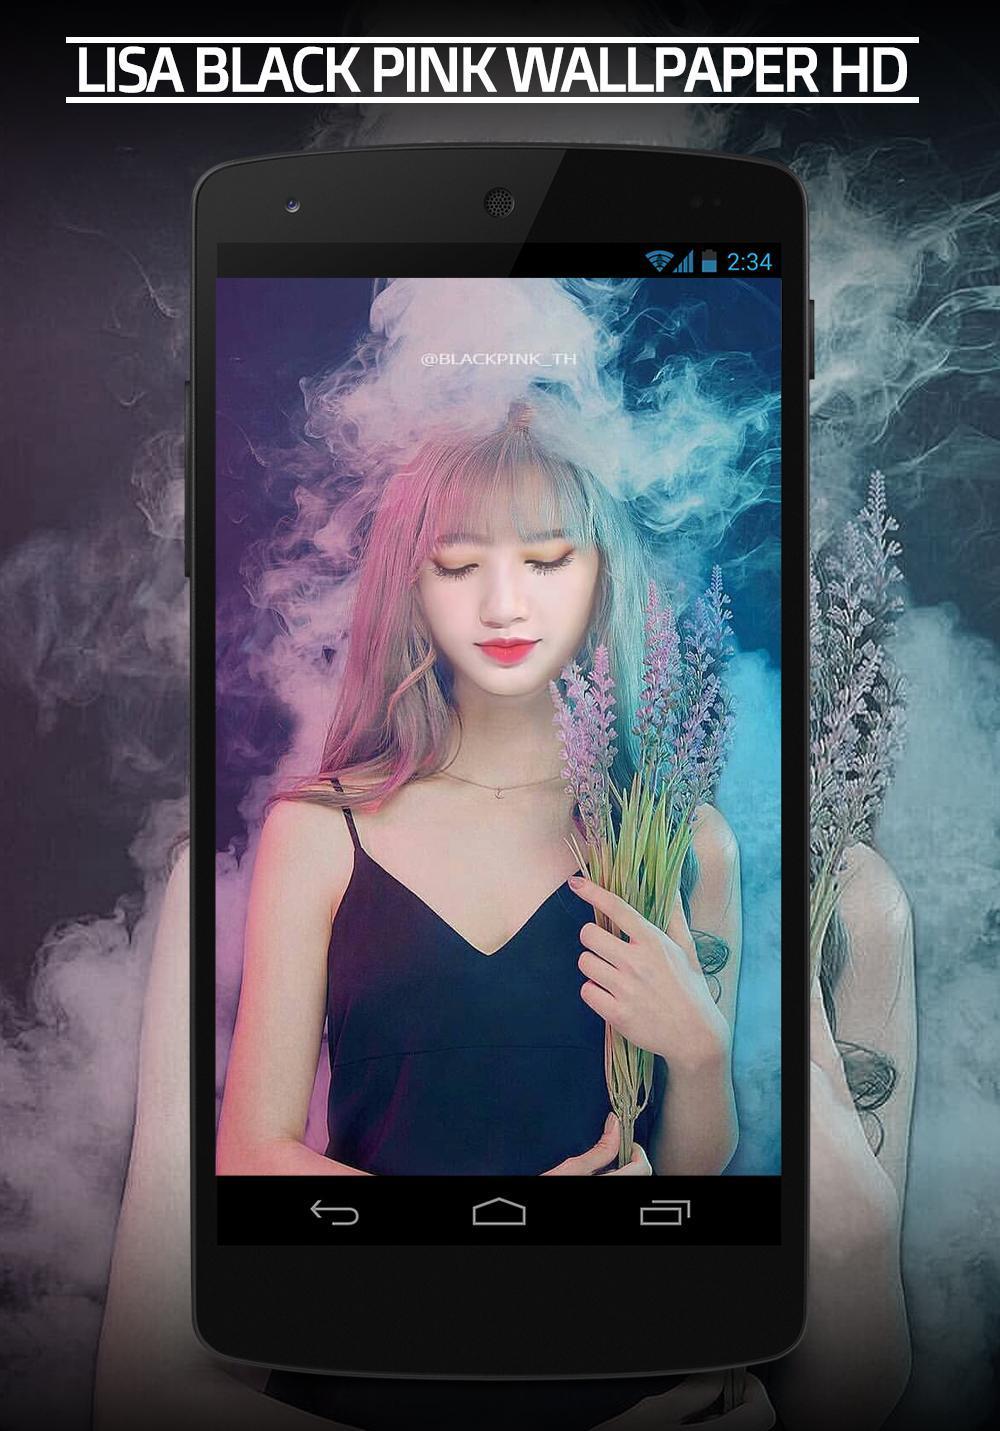 Lisa Blackpink Wallpaper Hd Kpop For Android Apk Download